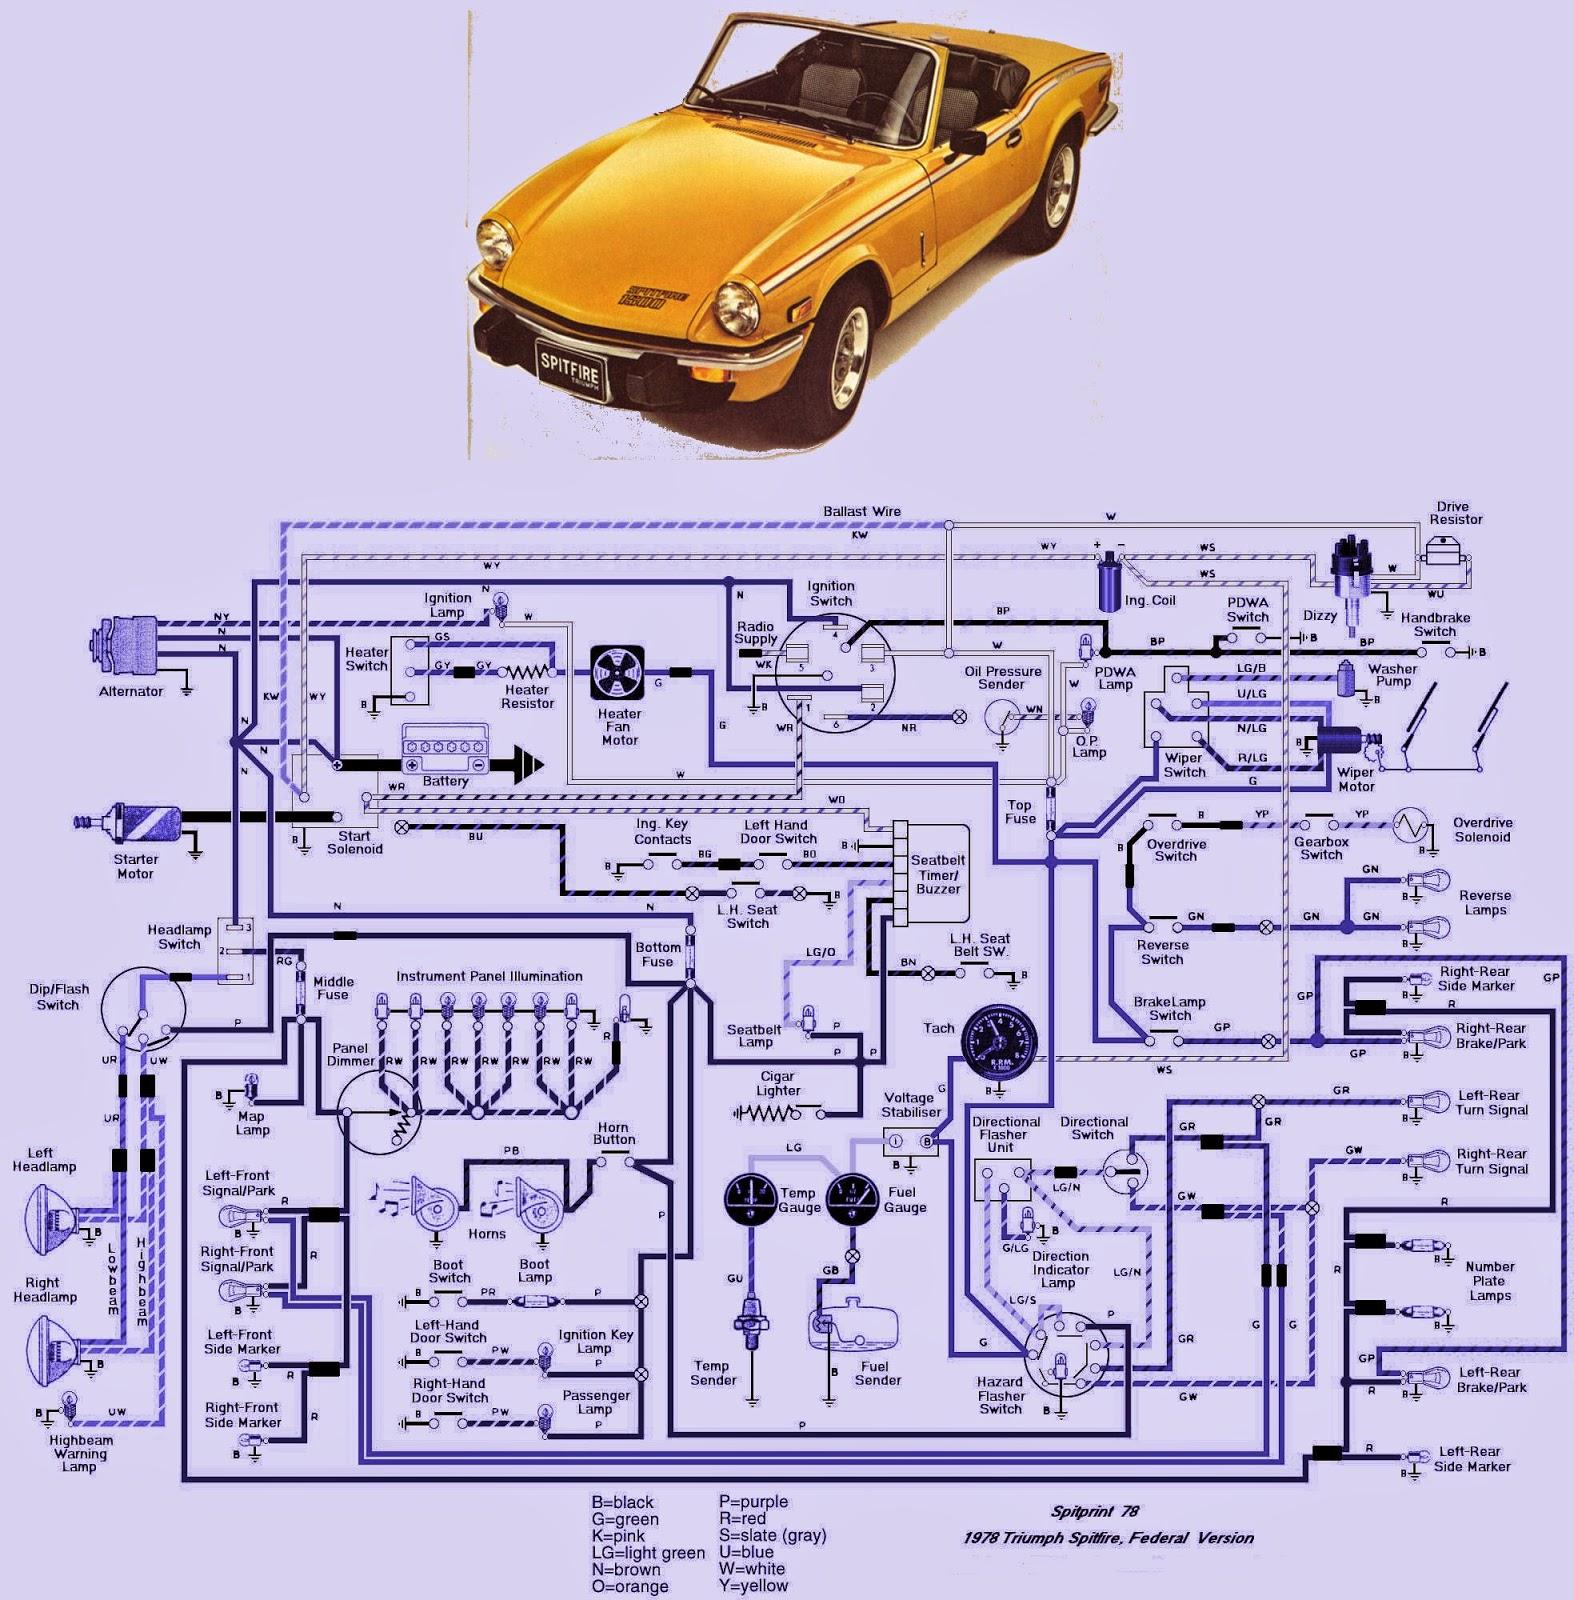 1978 triumph spitfire wiring diagram trusted wiring diagram triumph spitfire wiring schematic 1978 triumph spitfire wiring [ 1574 x 1600 Pixel ]